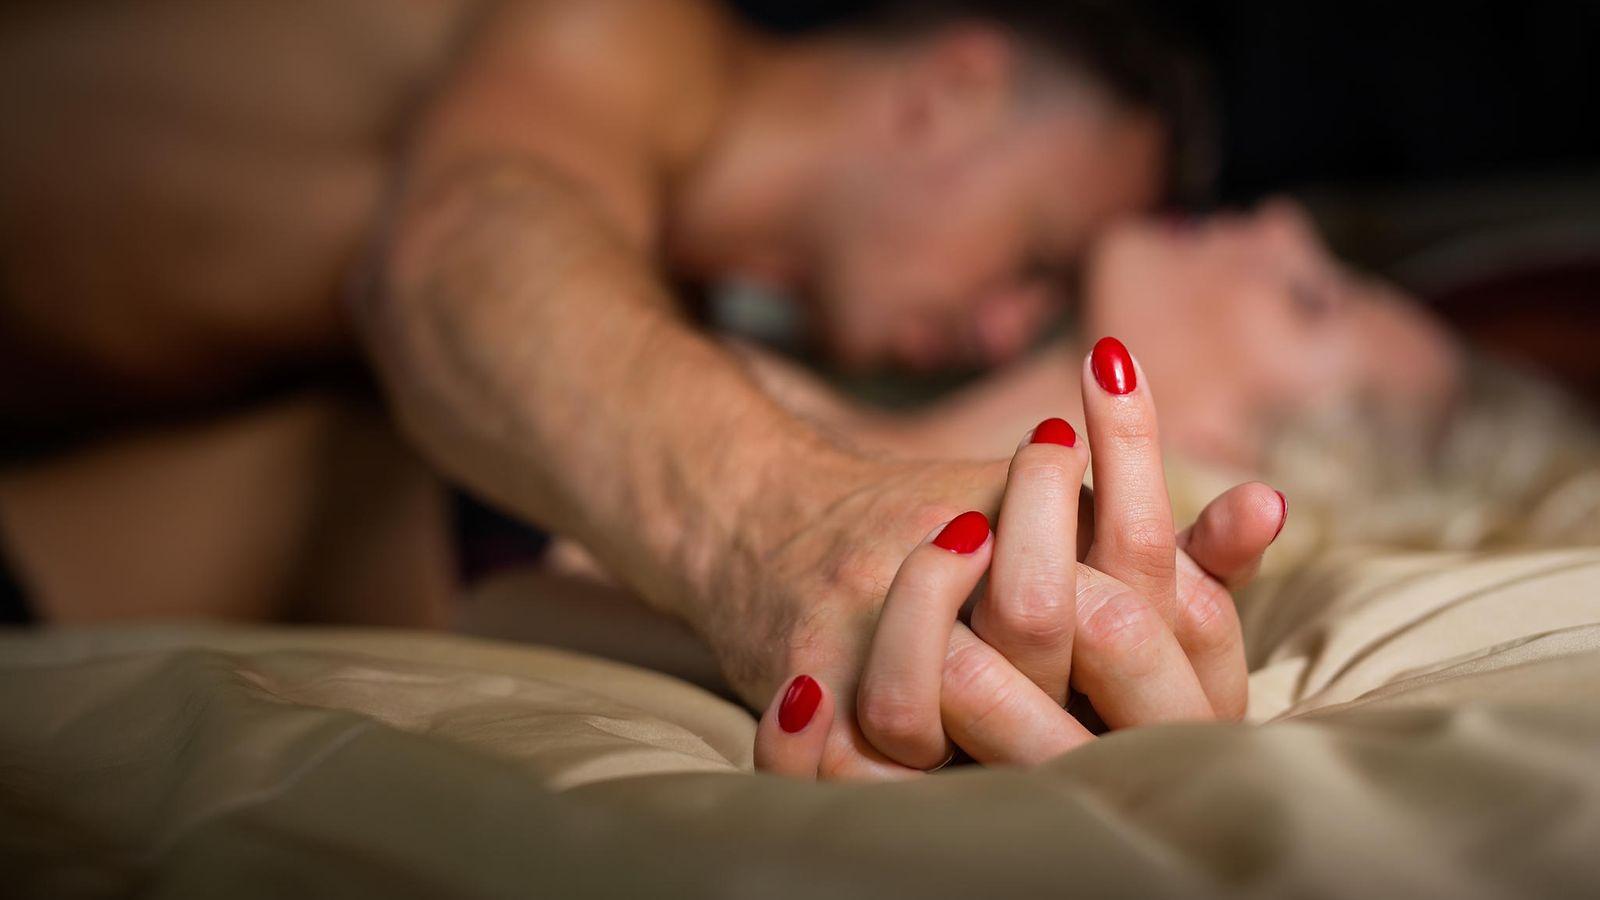 sugardating danmark sex og samliv